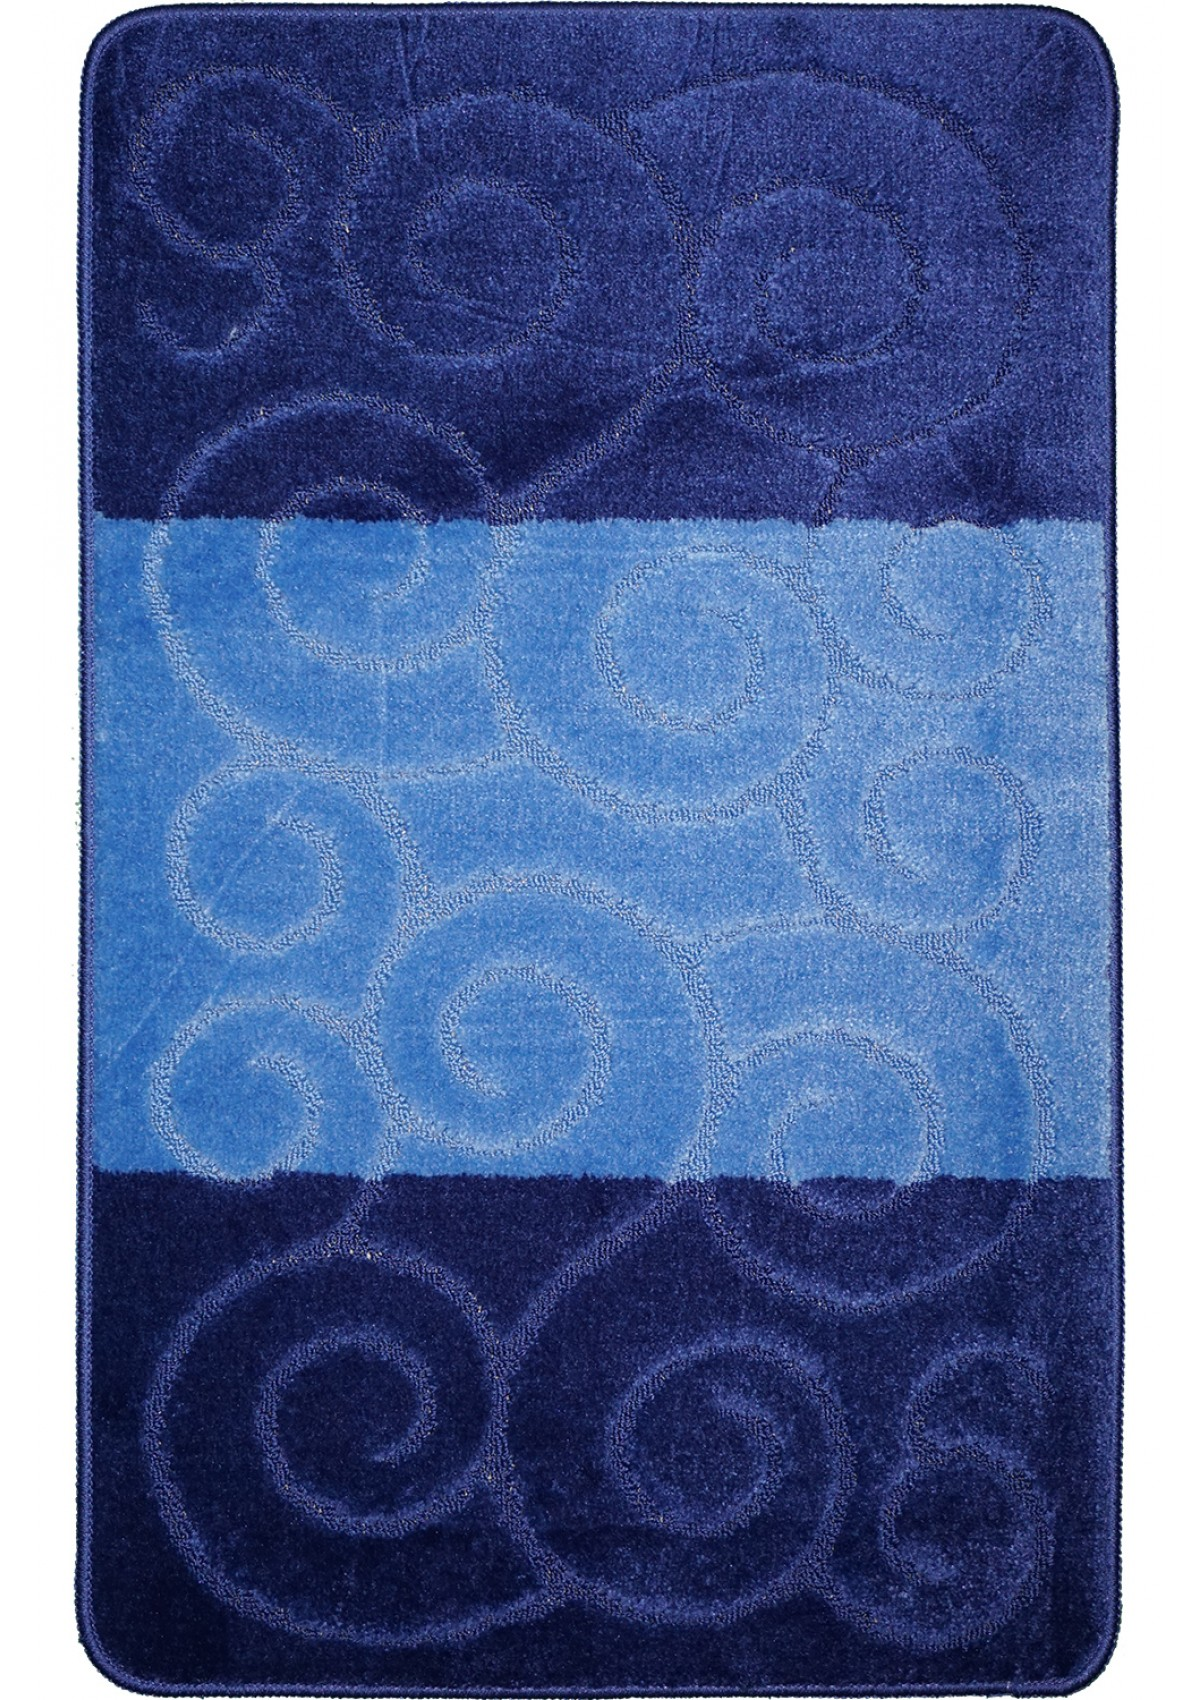 Килимок SILE BQ 2582 pc2 D.BLUE